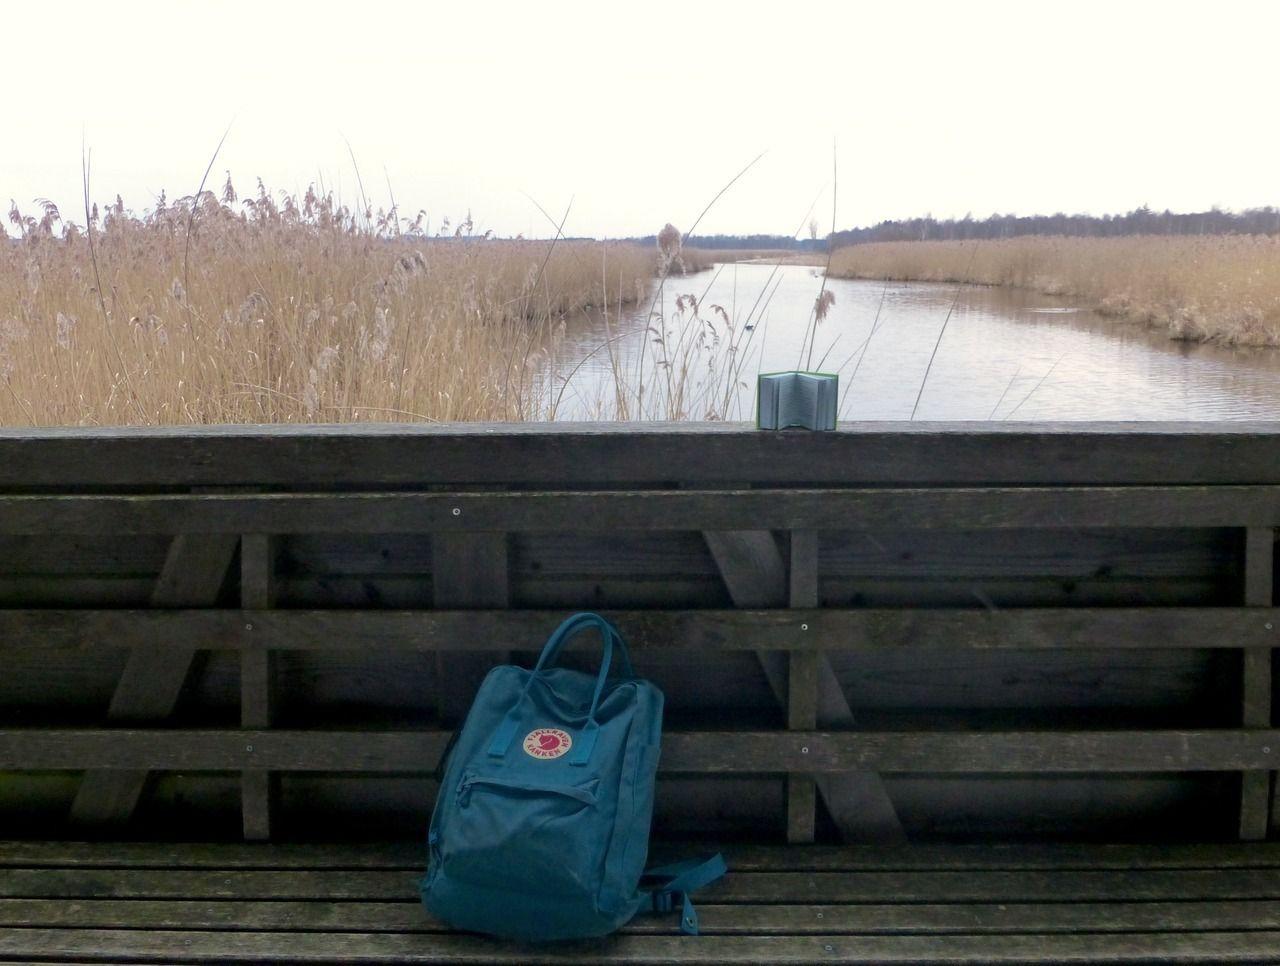 Great spot for a book-break - #backpaker #bench #bok #book #booklr #break #buch #Federsee #fjällräven #heritage #kånken #lake #landscape #leggere #lesen #lire #livre #pause #pretty #rucksack #schön #site #sjö #world